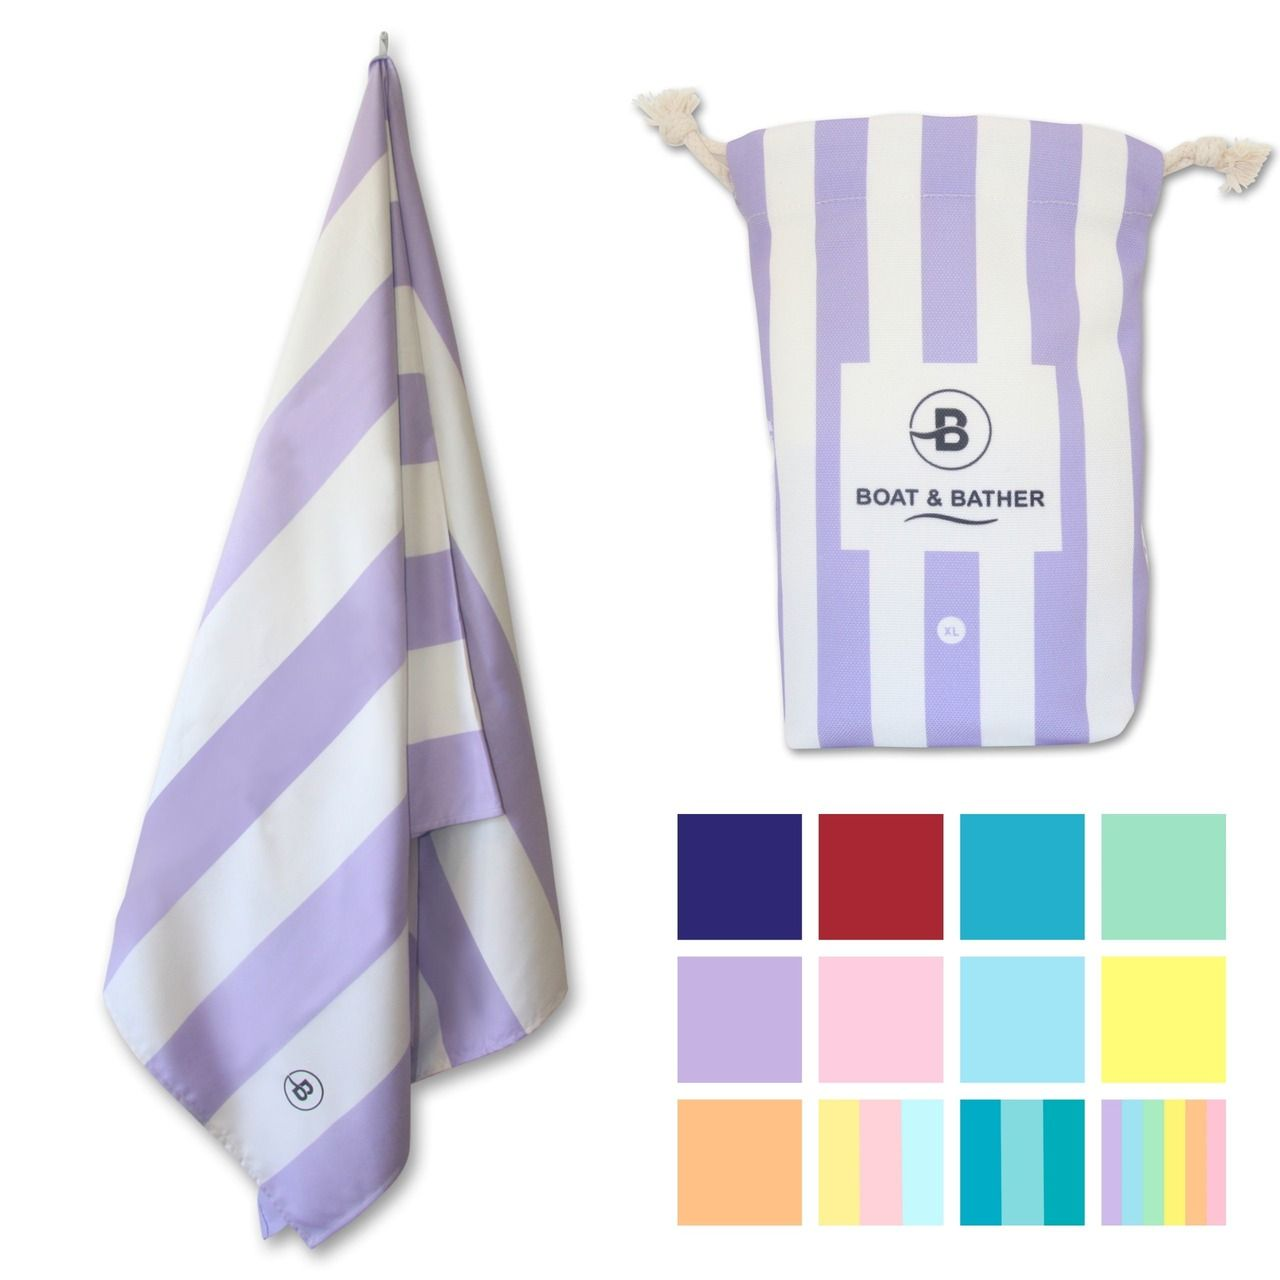 Candy Purple Microfiber Beach Towel Extra Large 200x90cm